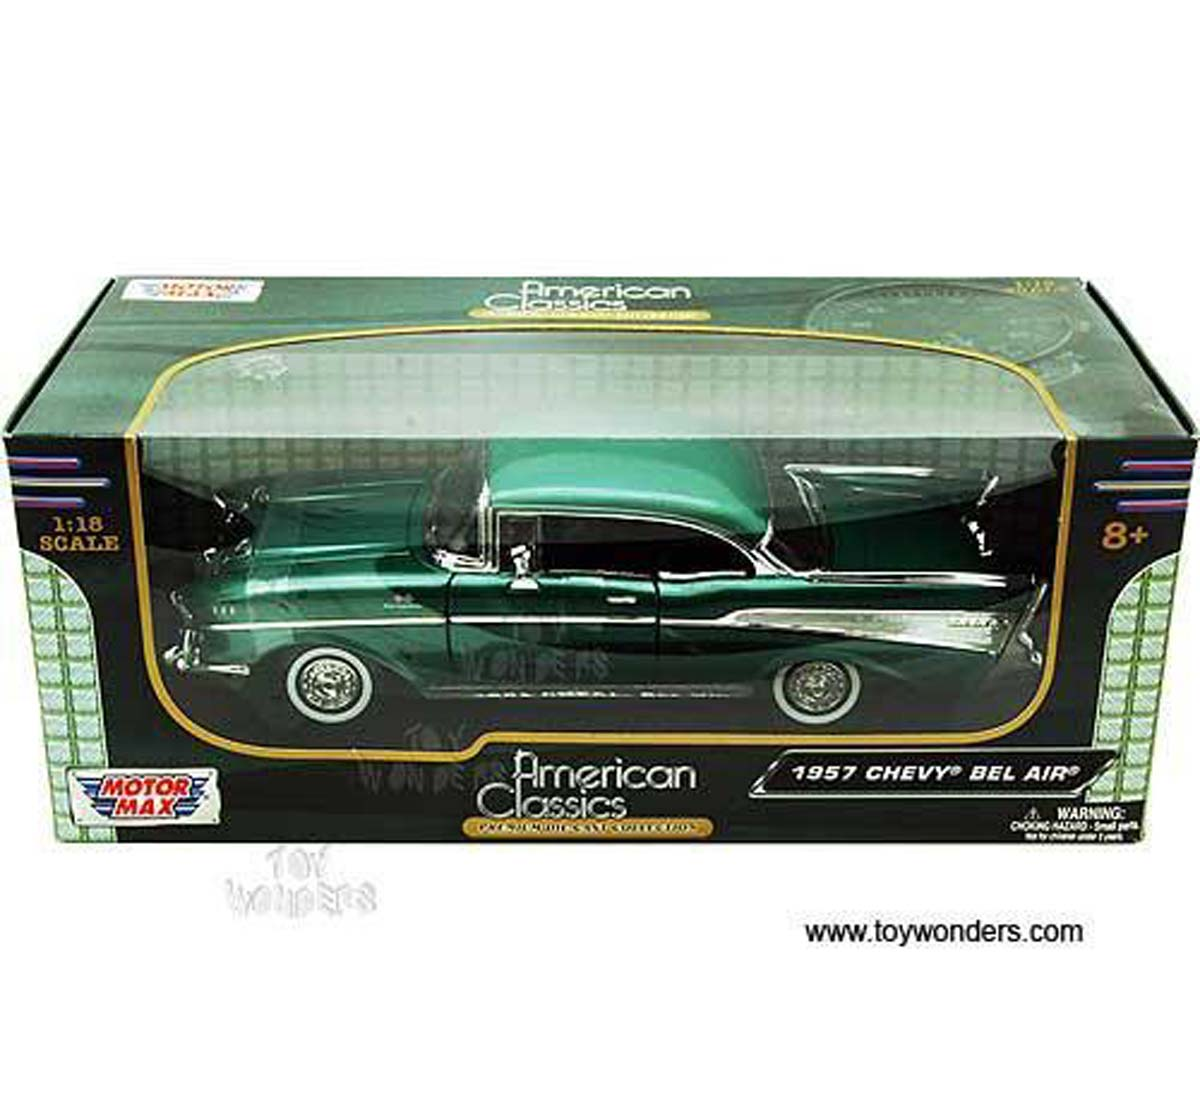 Motormax | Motormax 1:18 1957 Chevy Bel Air Diecast Car Vehicles for Kids Age 8Y+ (Black)